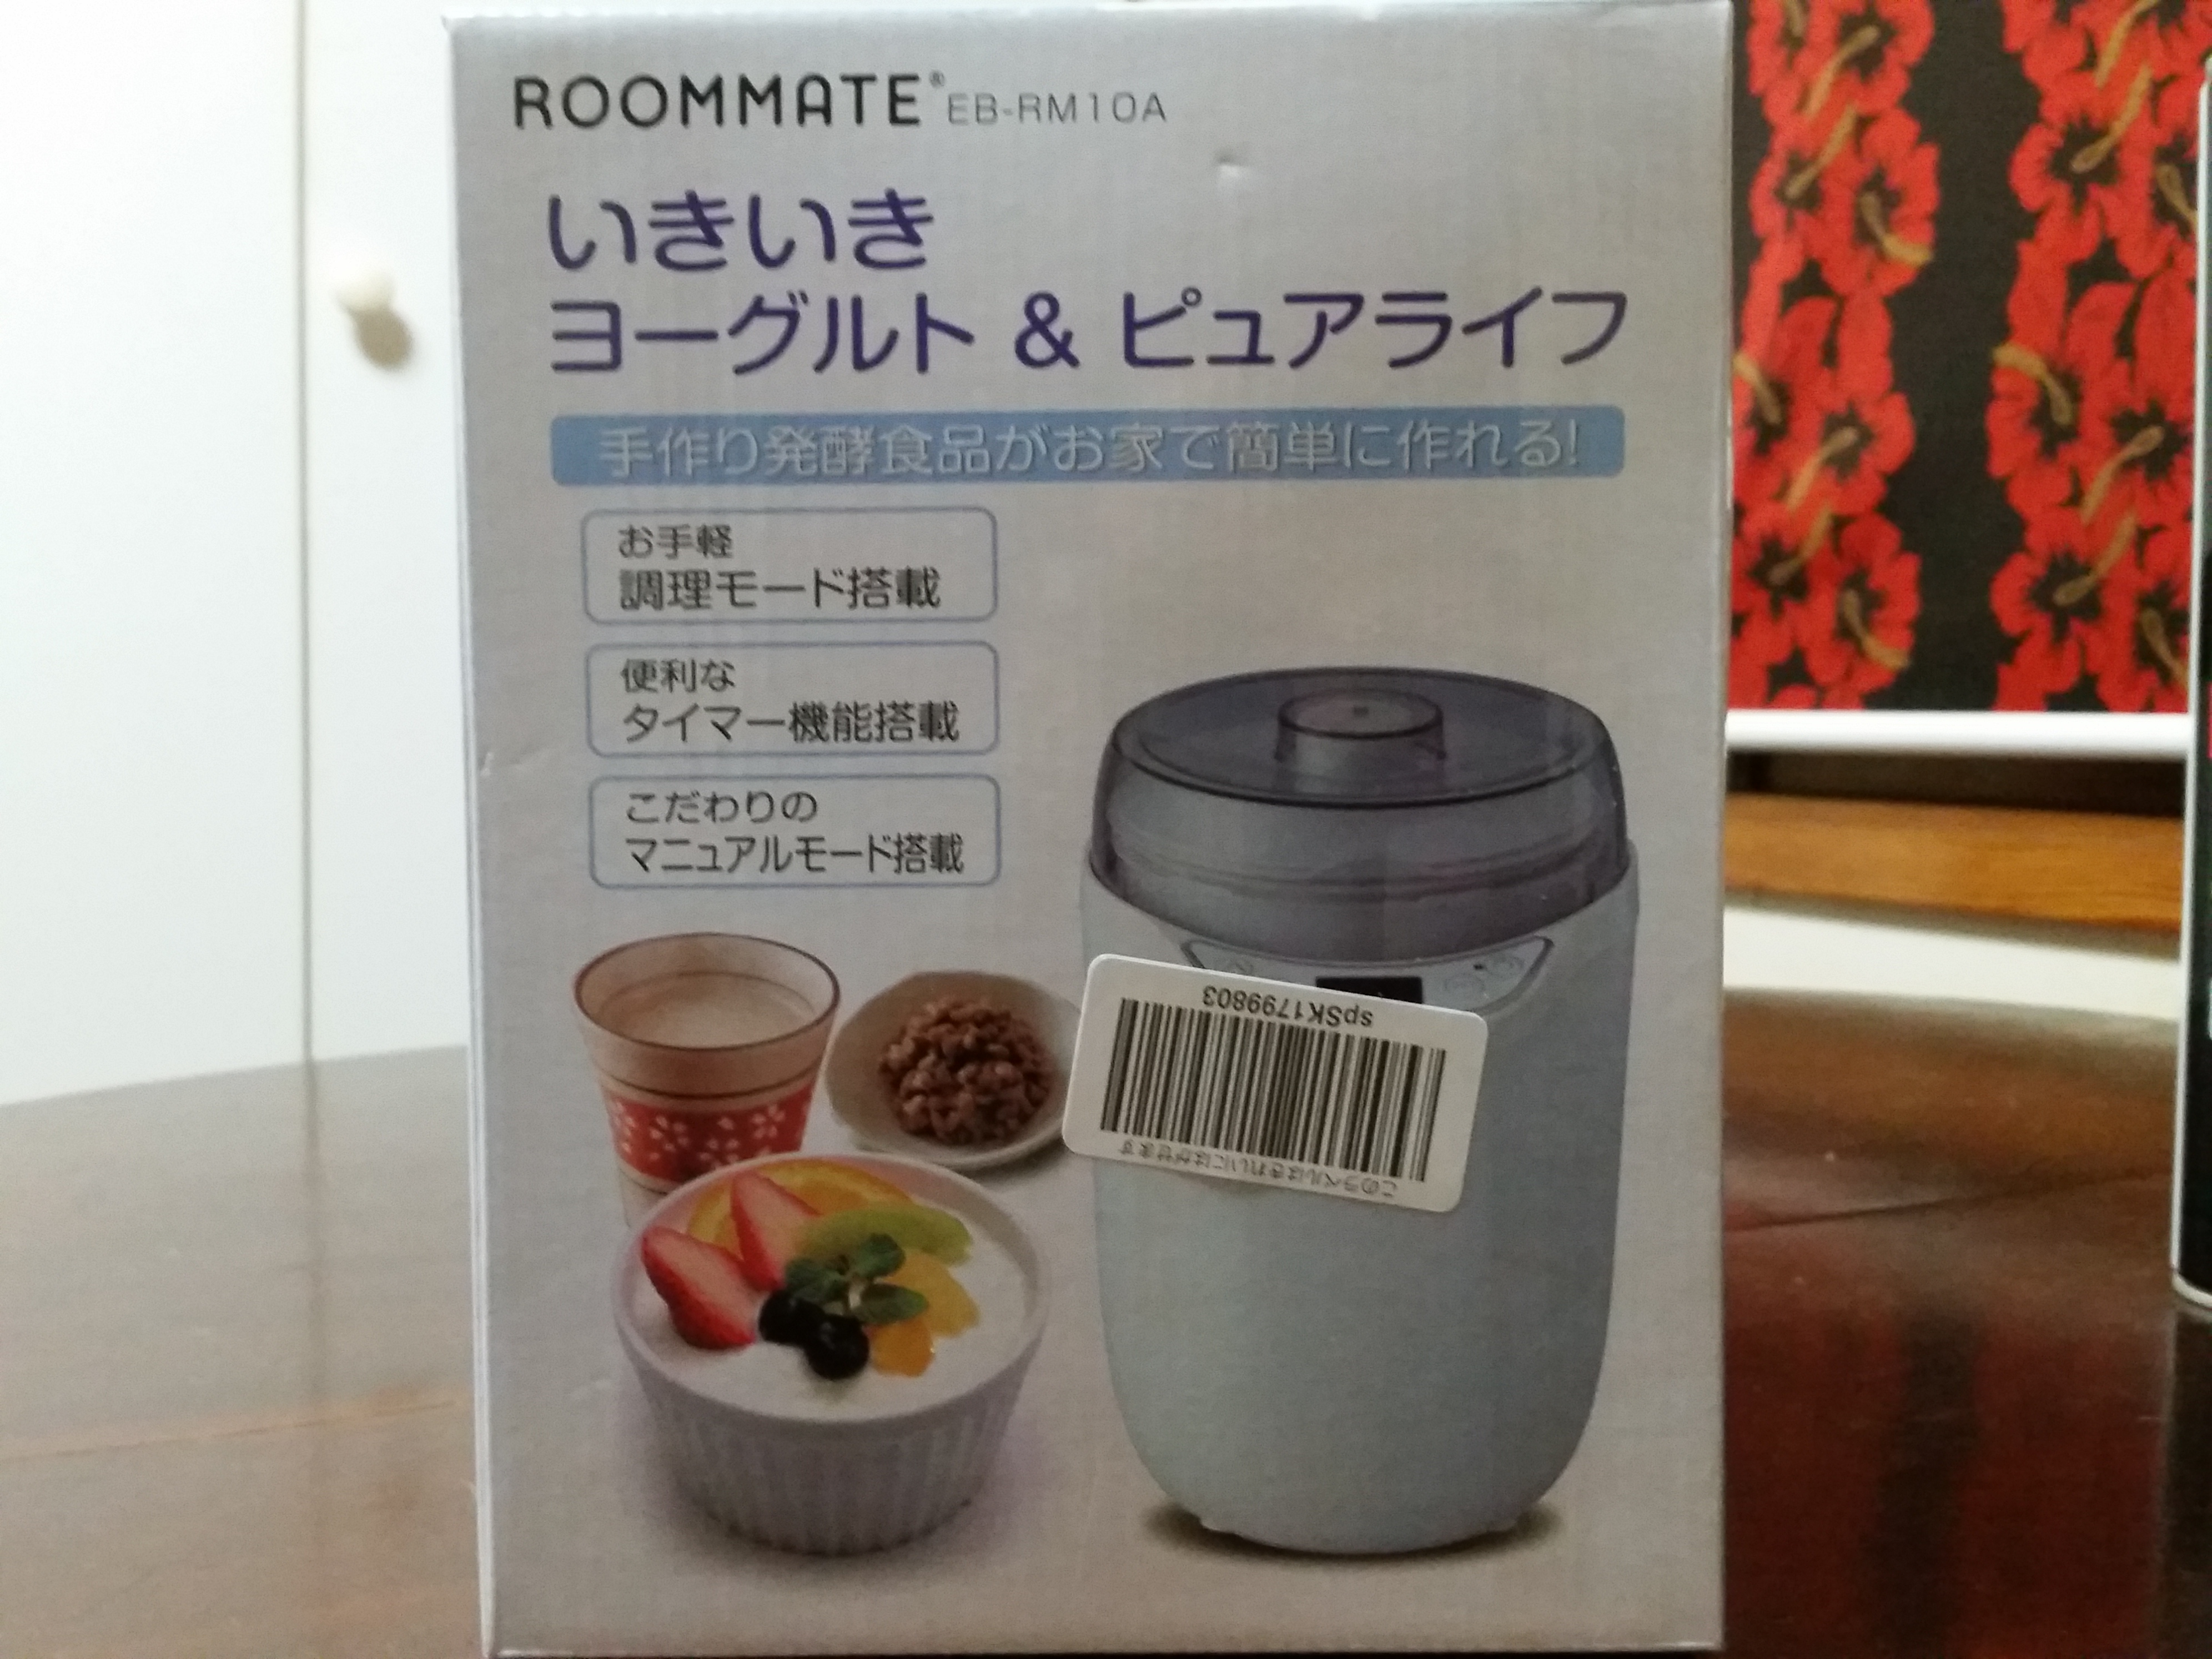 ROOMMATE:いきいきヨーグルト&ピュアライフ